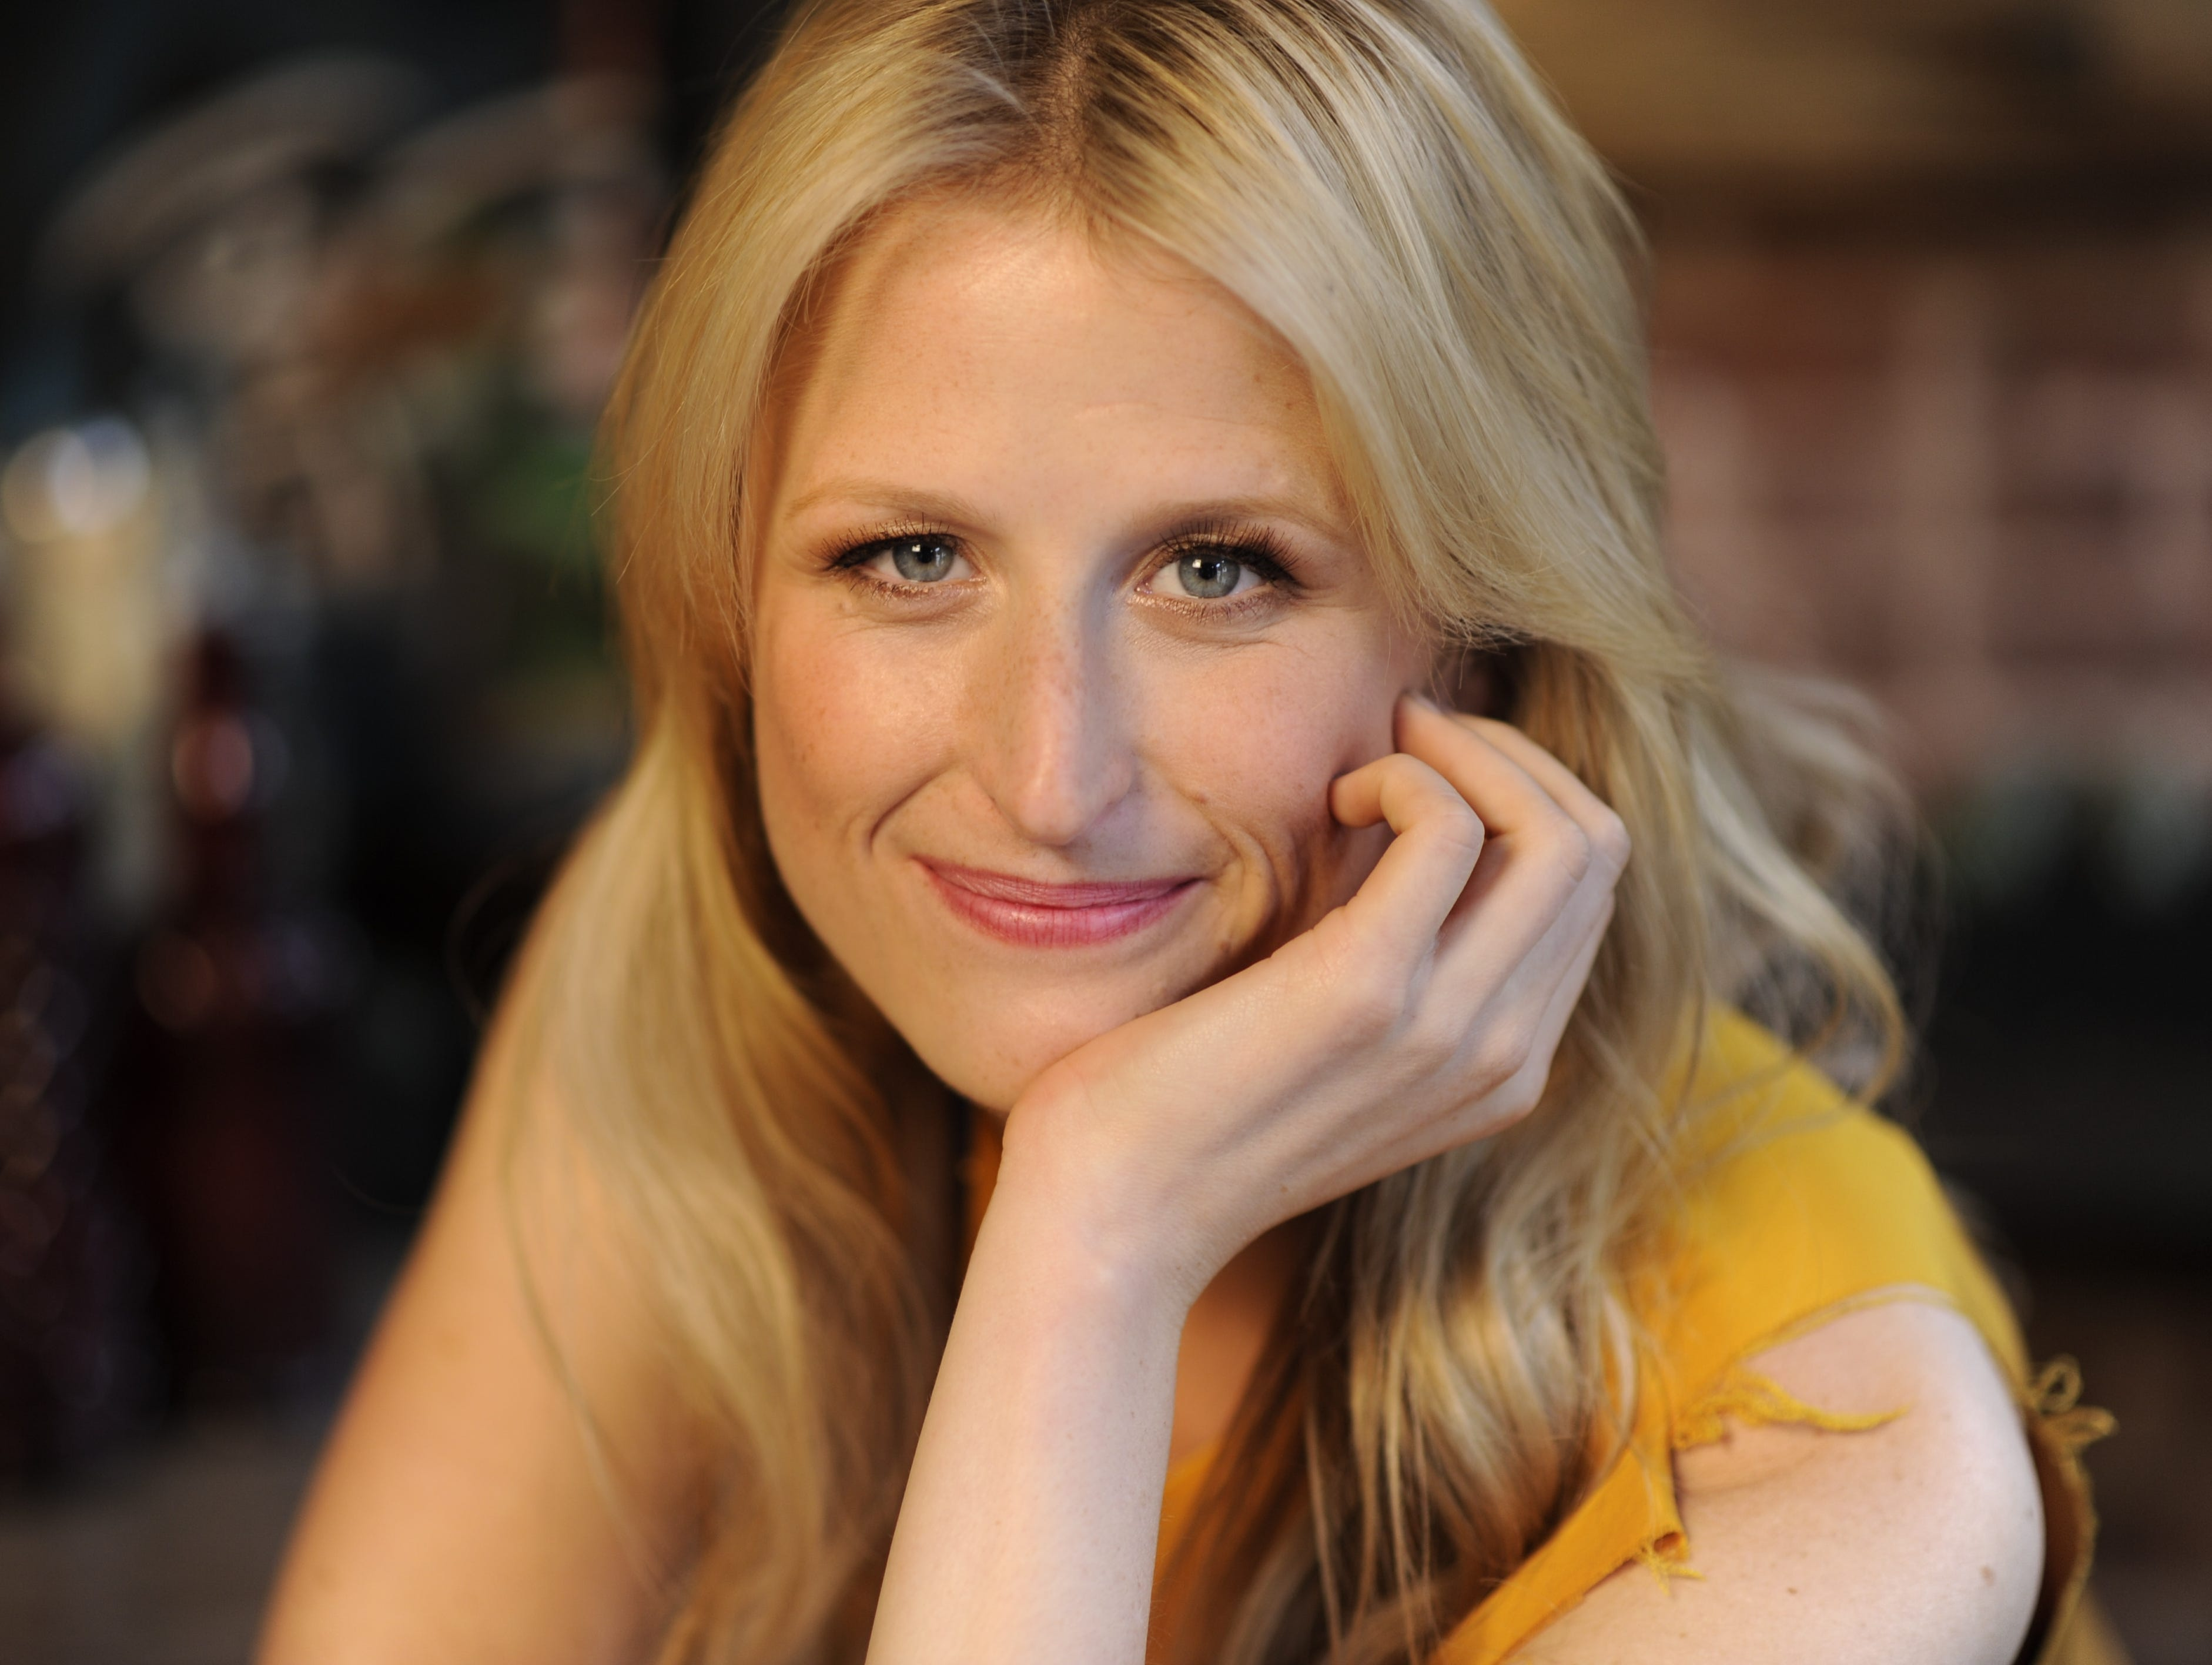 mamie gummer actress